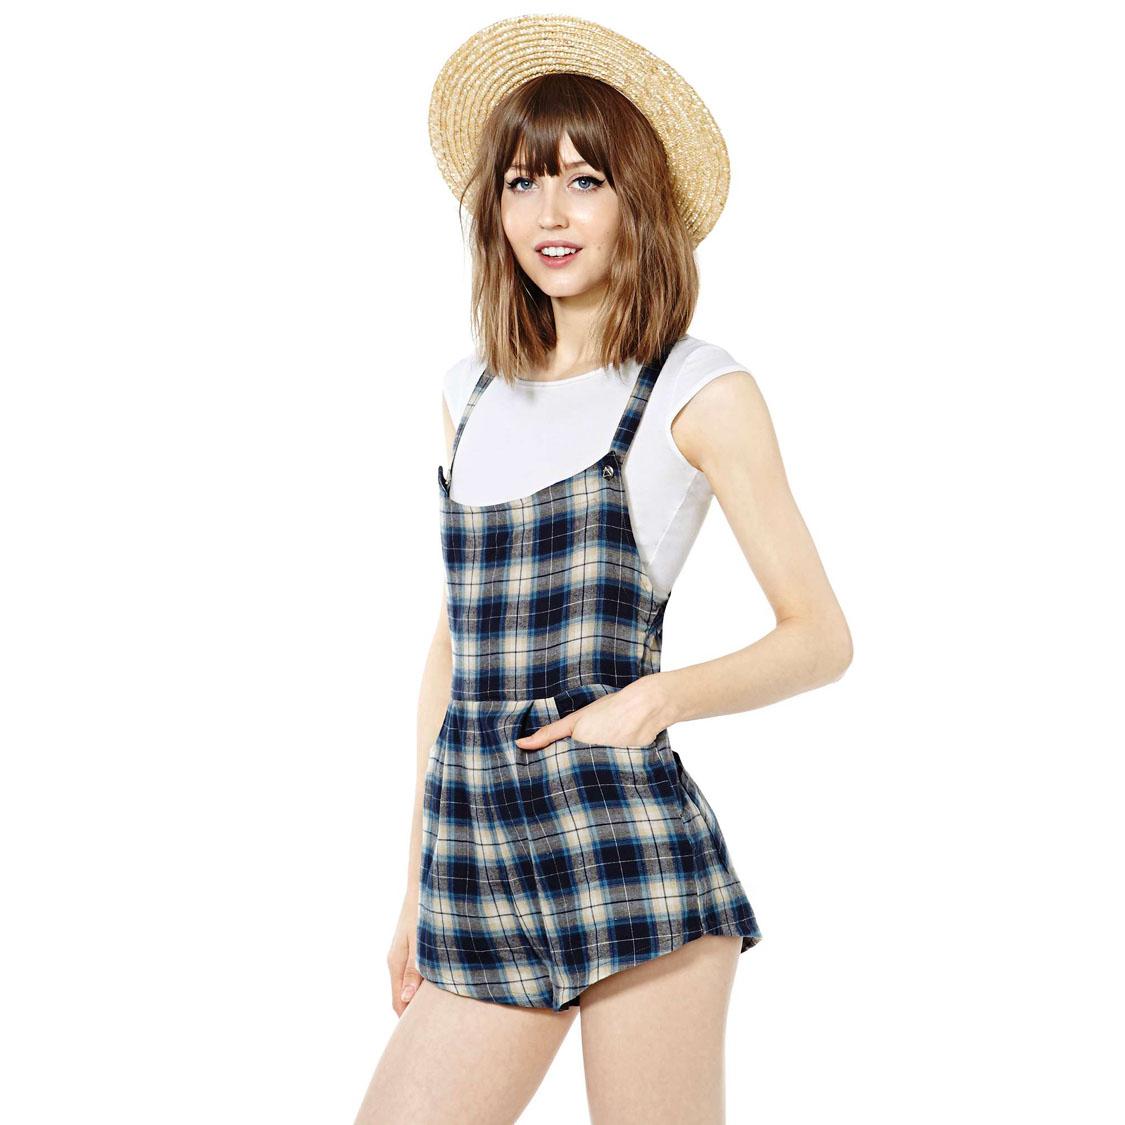 Plaid double pocket bag back spaghetti strap sleeveless female shorts jumpsuit haoduoyi - Fashion company store